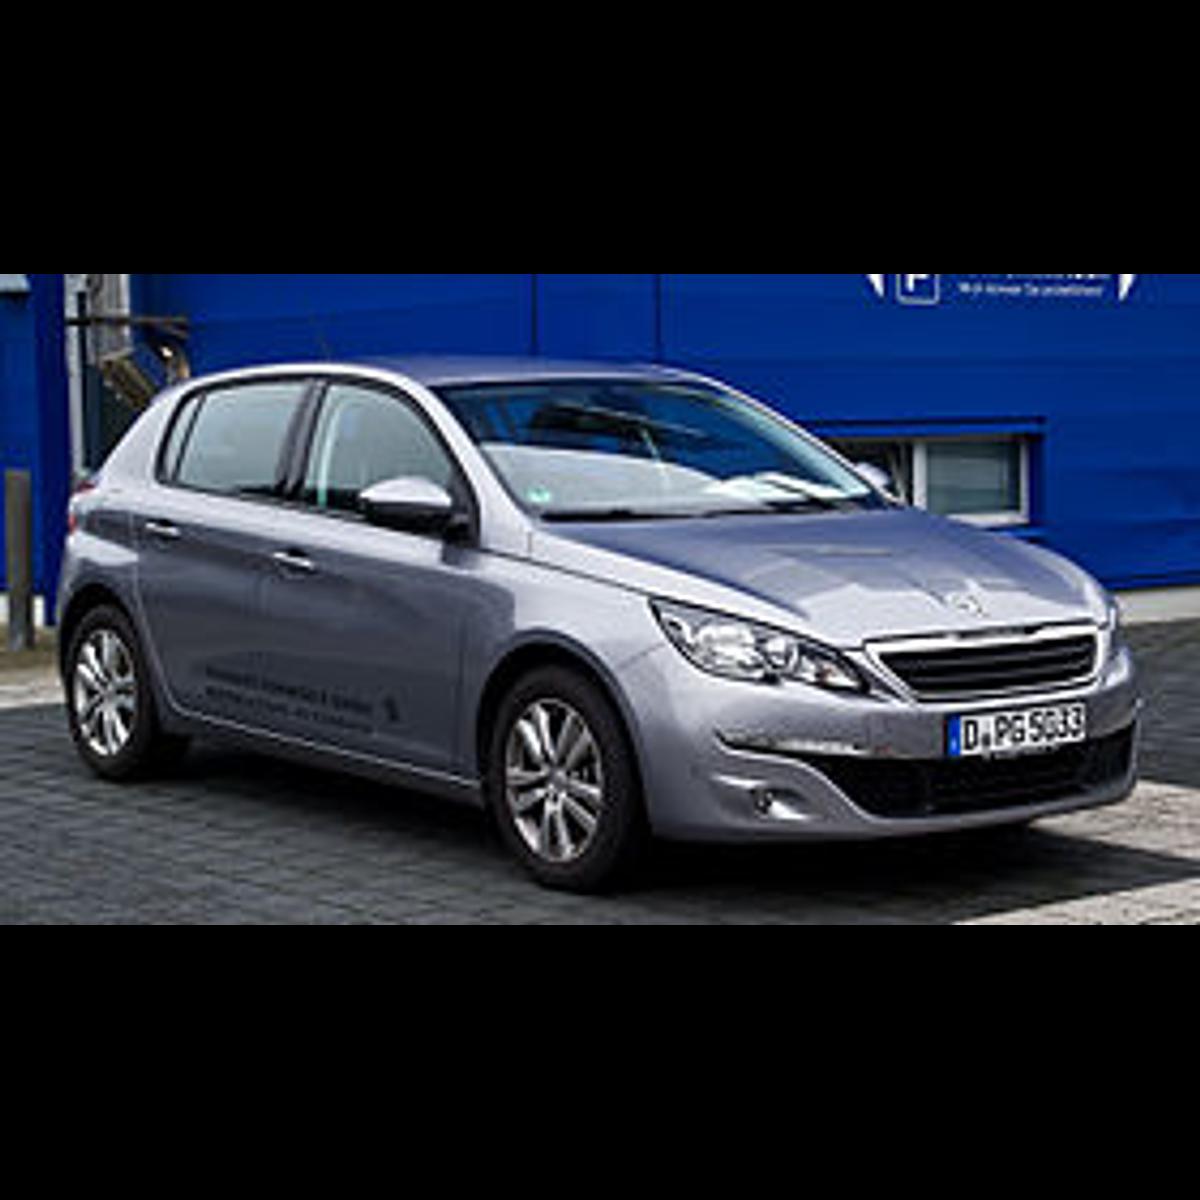 Manual De Taller Peugeot 308  2013